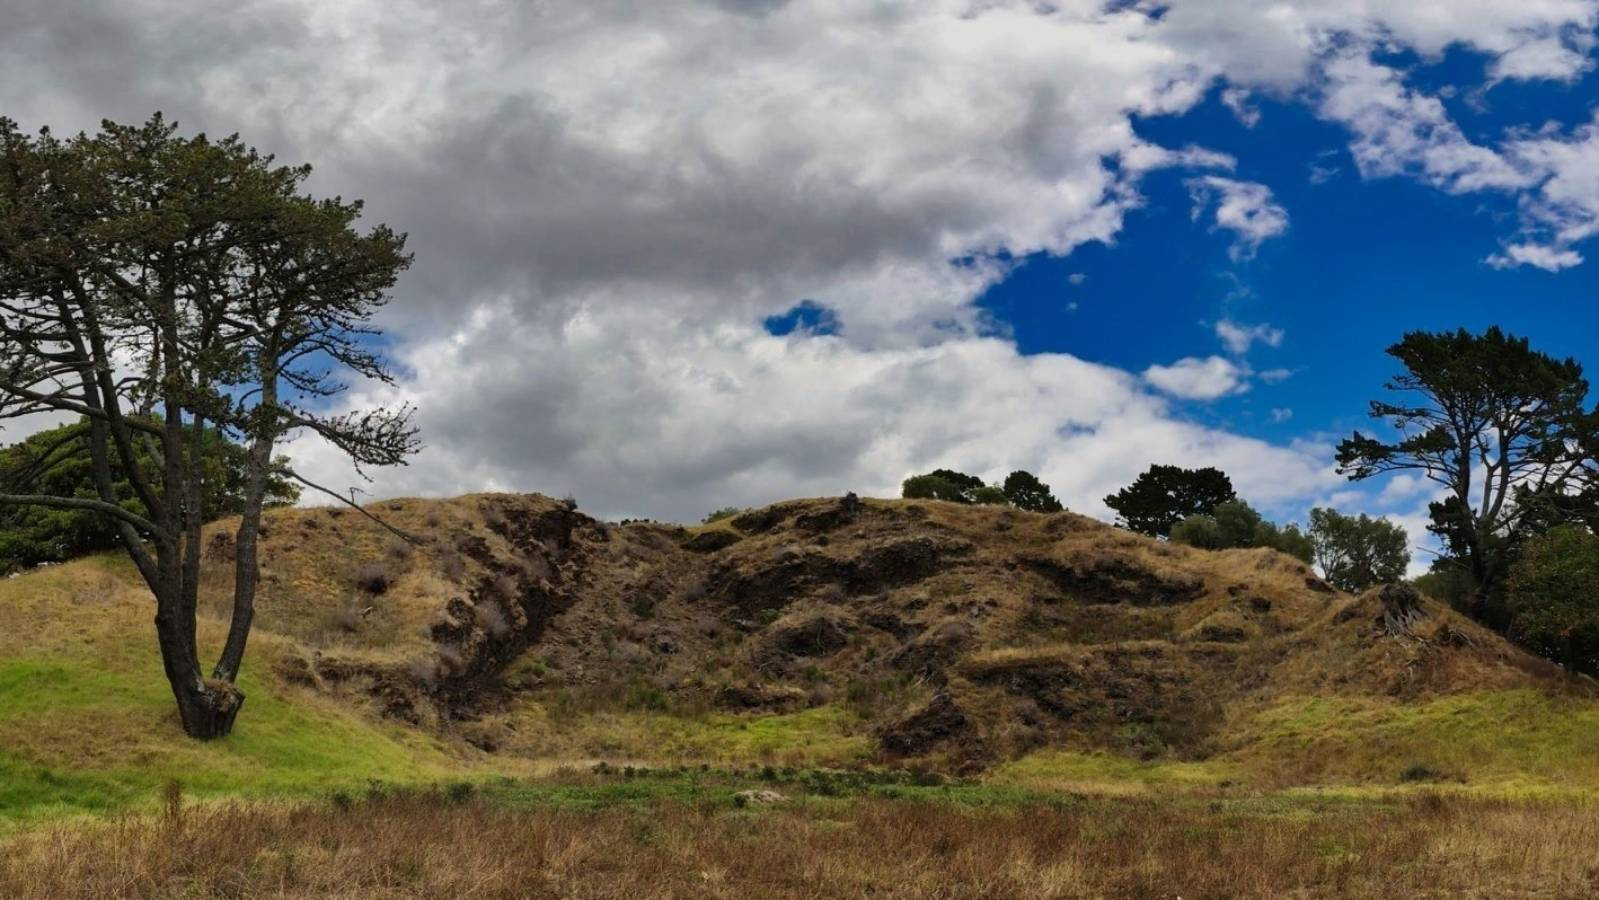 Ōtāhuhu woman plans to protest tree removal plans